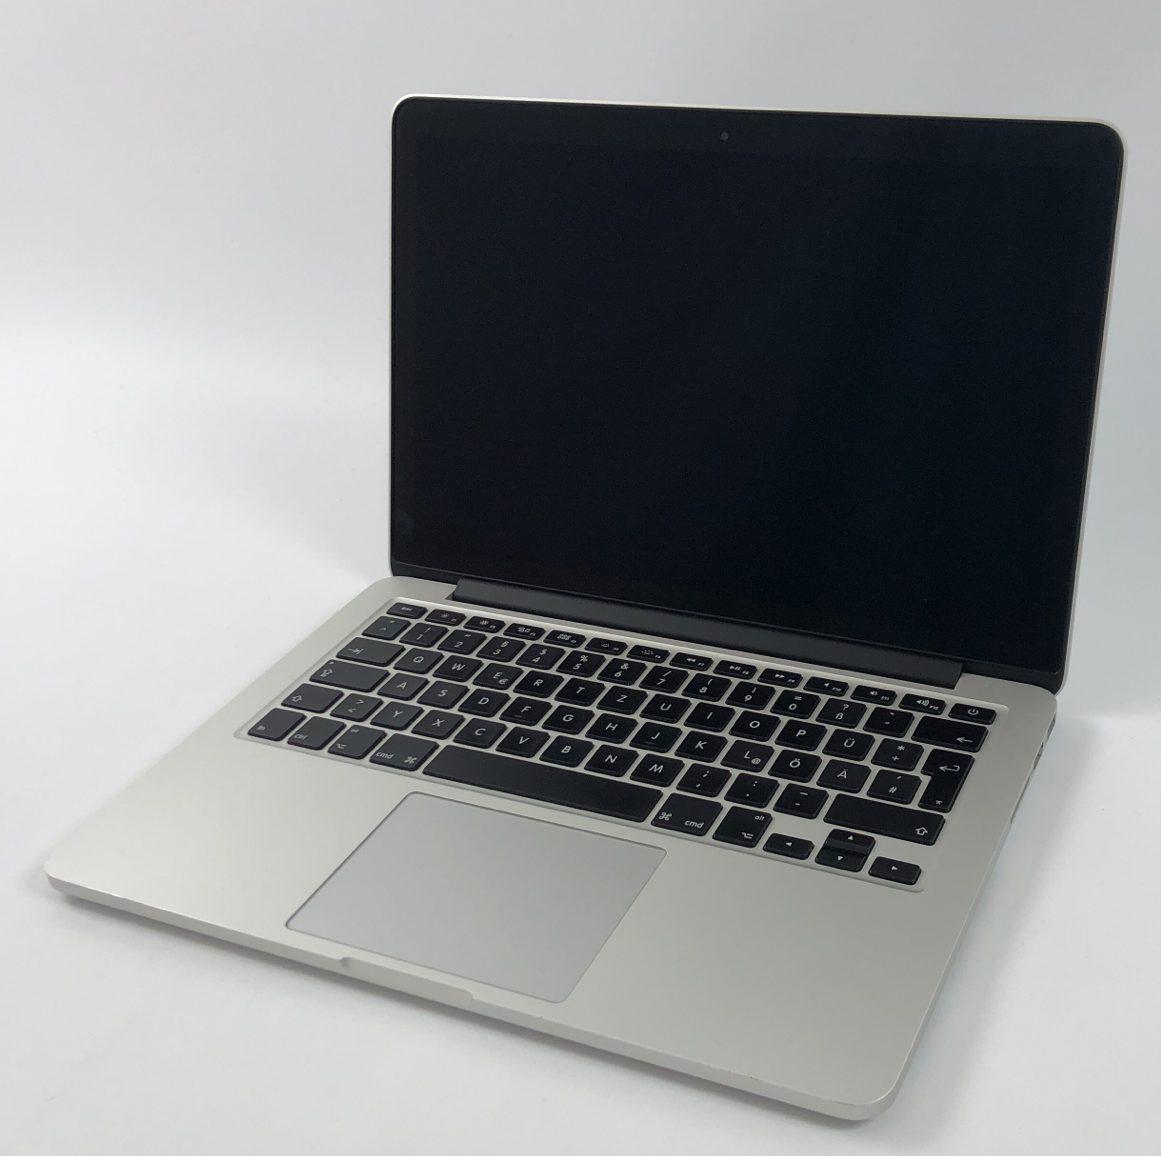 "MacBook Pro Retina 13"" Early 2015 (Intel Core i5 2.9 GHz 16 GB RAM 256 GB SSD), Intel Core i5 2.9 GHz, 16 GB RAM, 256 GB SSD, Bild 1"